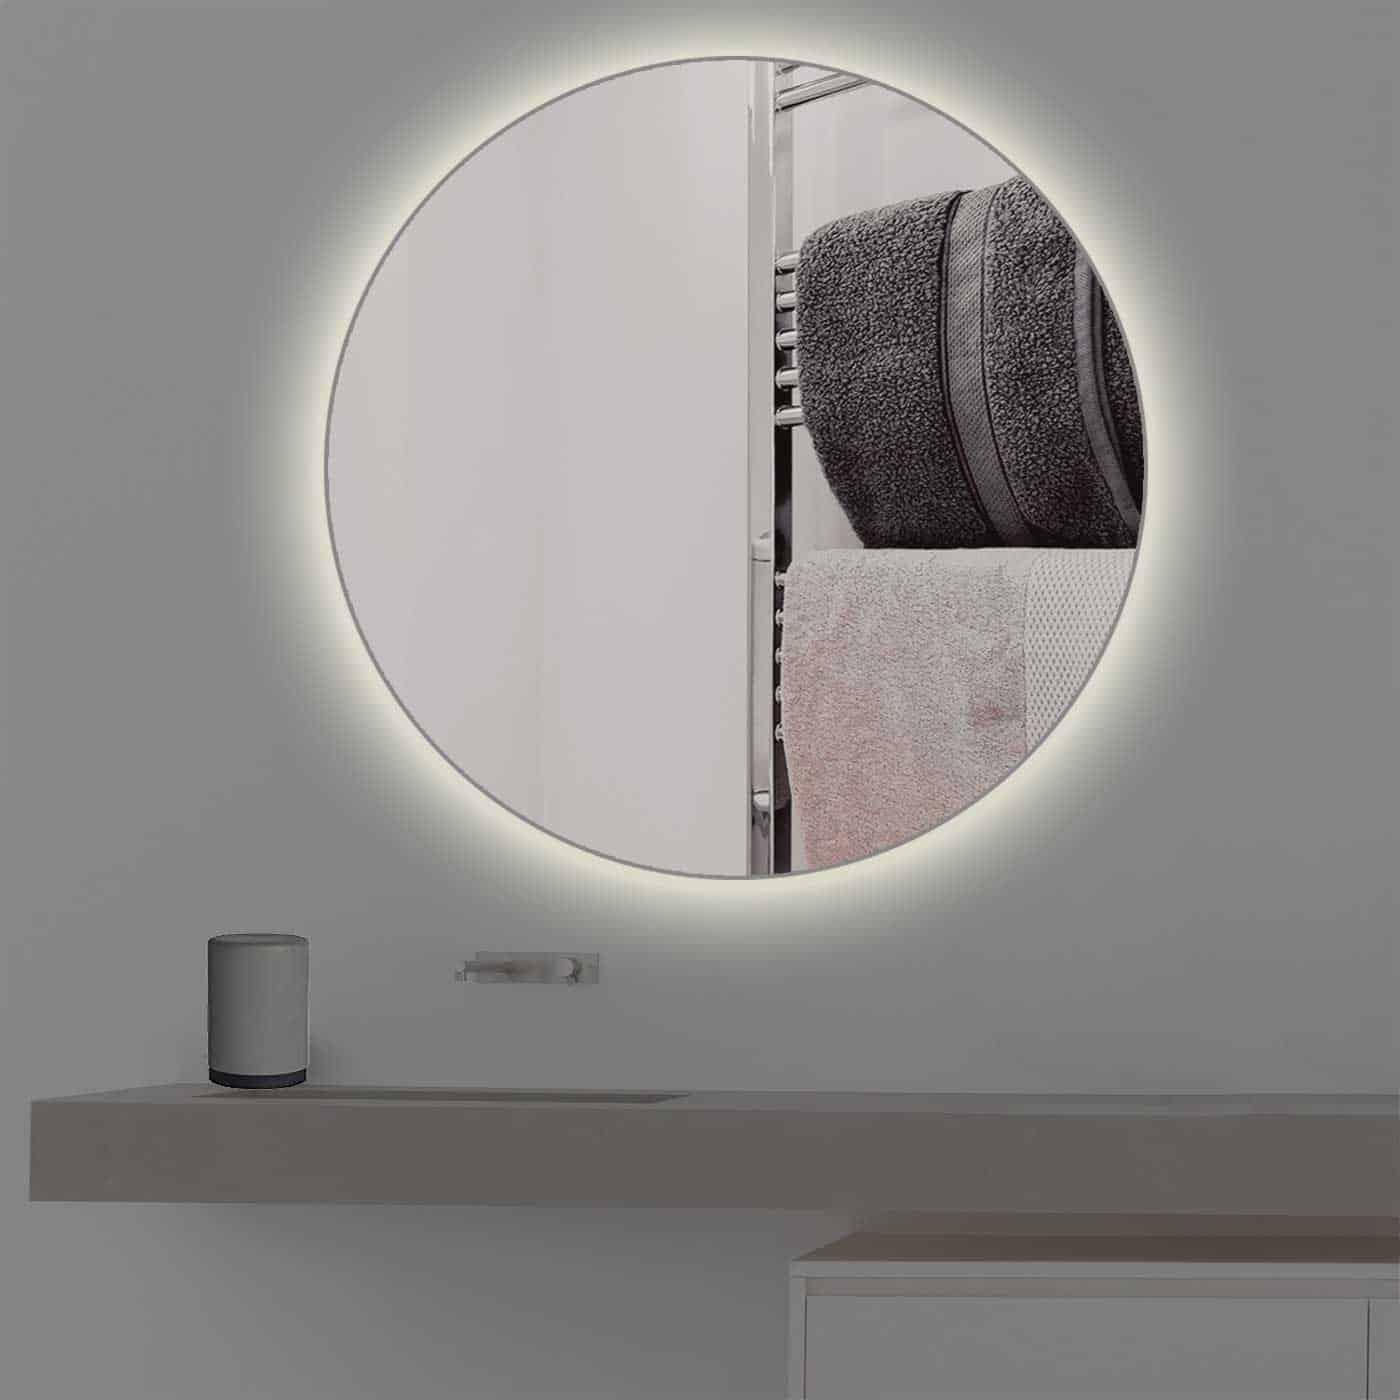 runder badspiegel mit beleuchtung t v gepr ft kostenloser versand. Black Bedroom Furniture Sets. Home Design Ideas